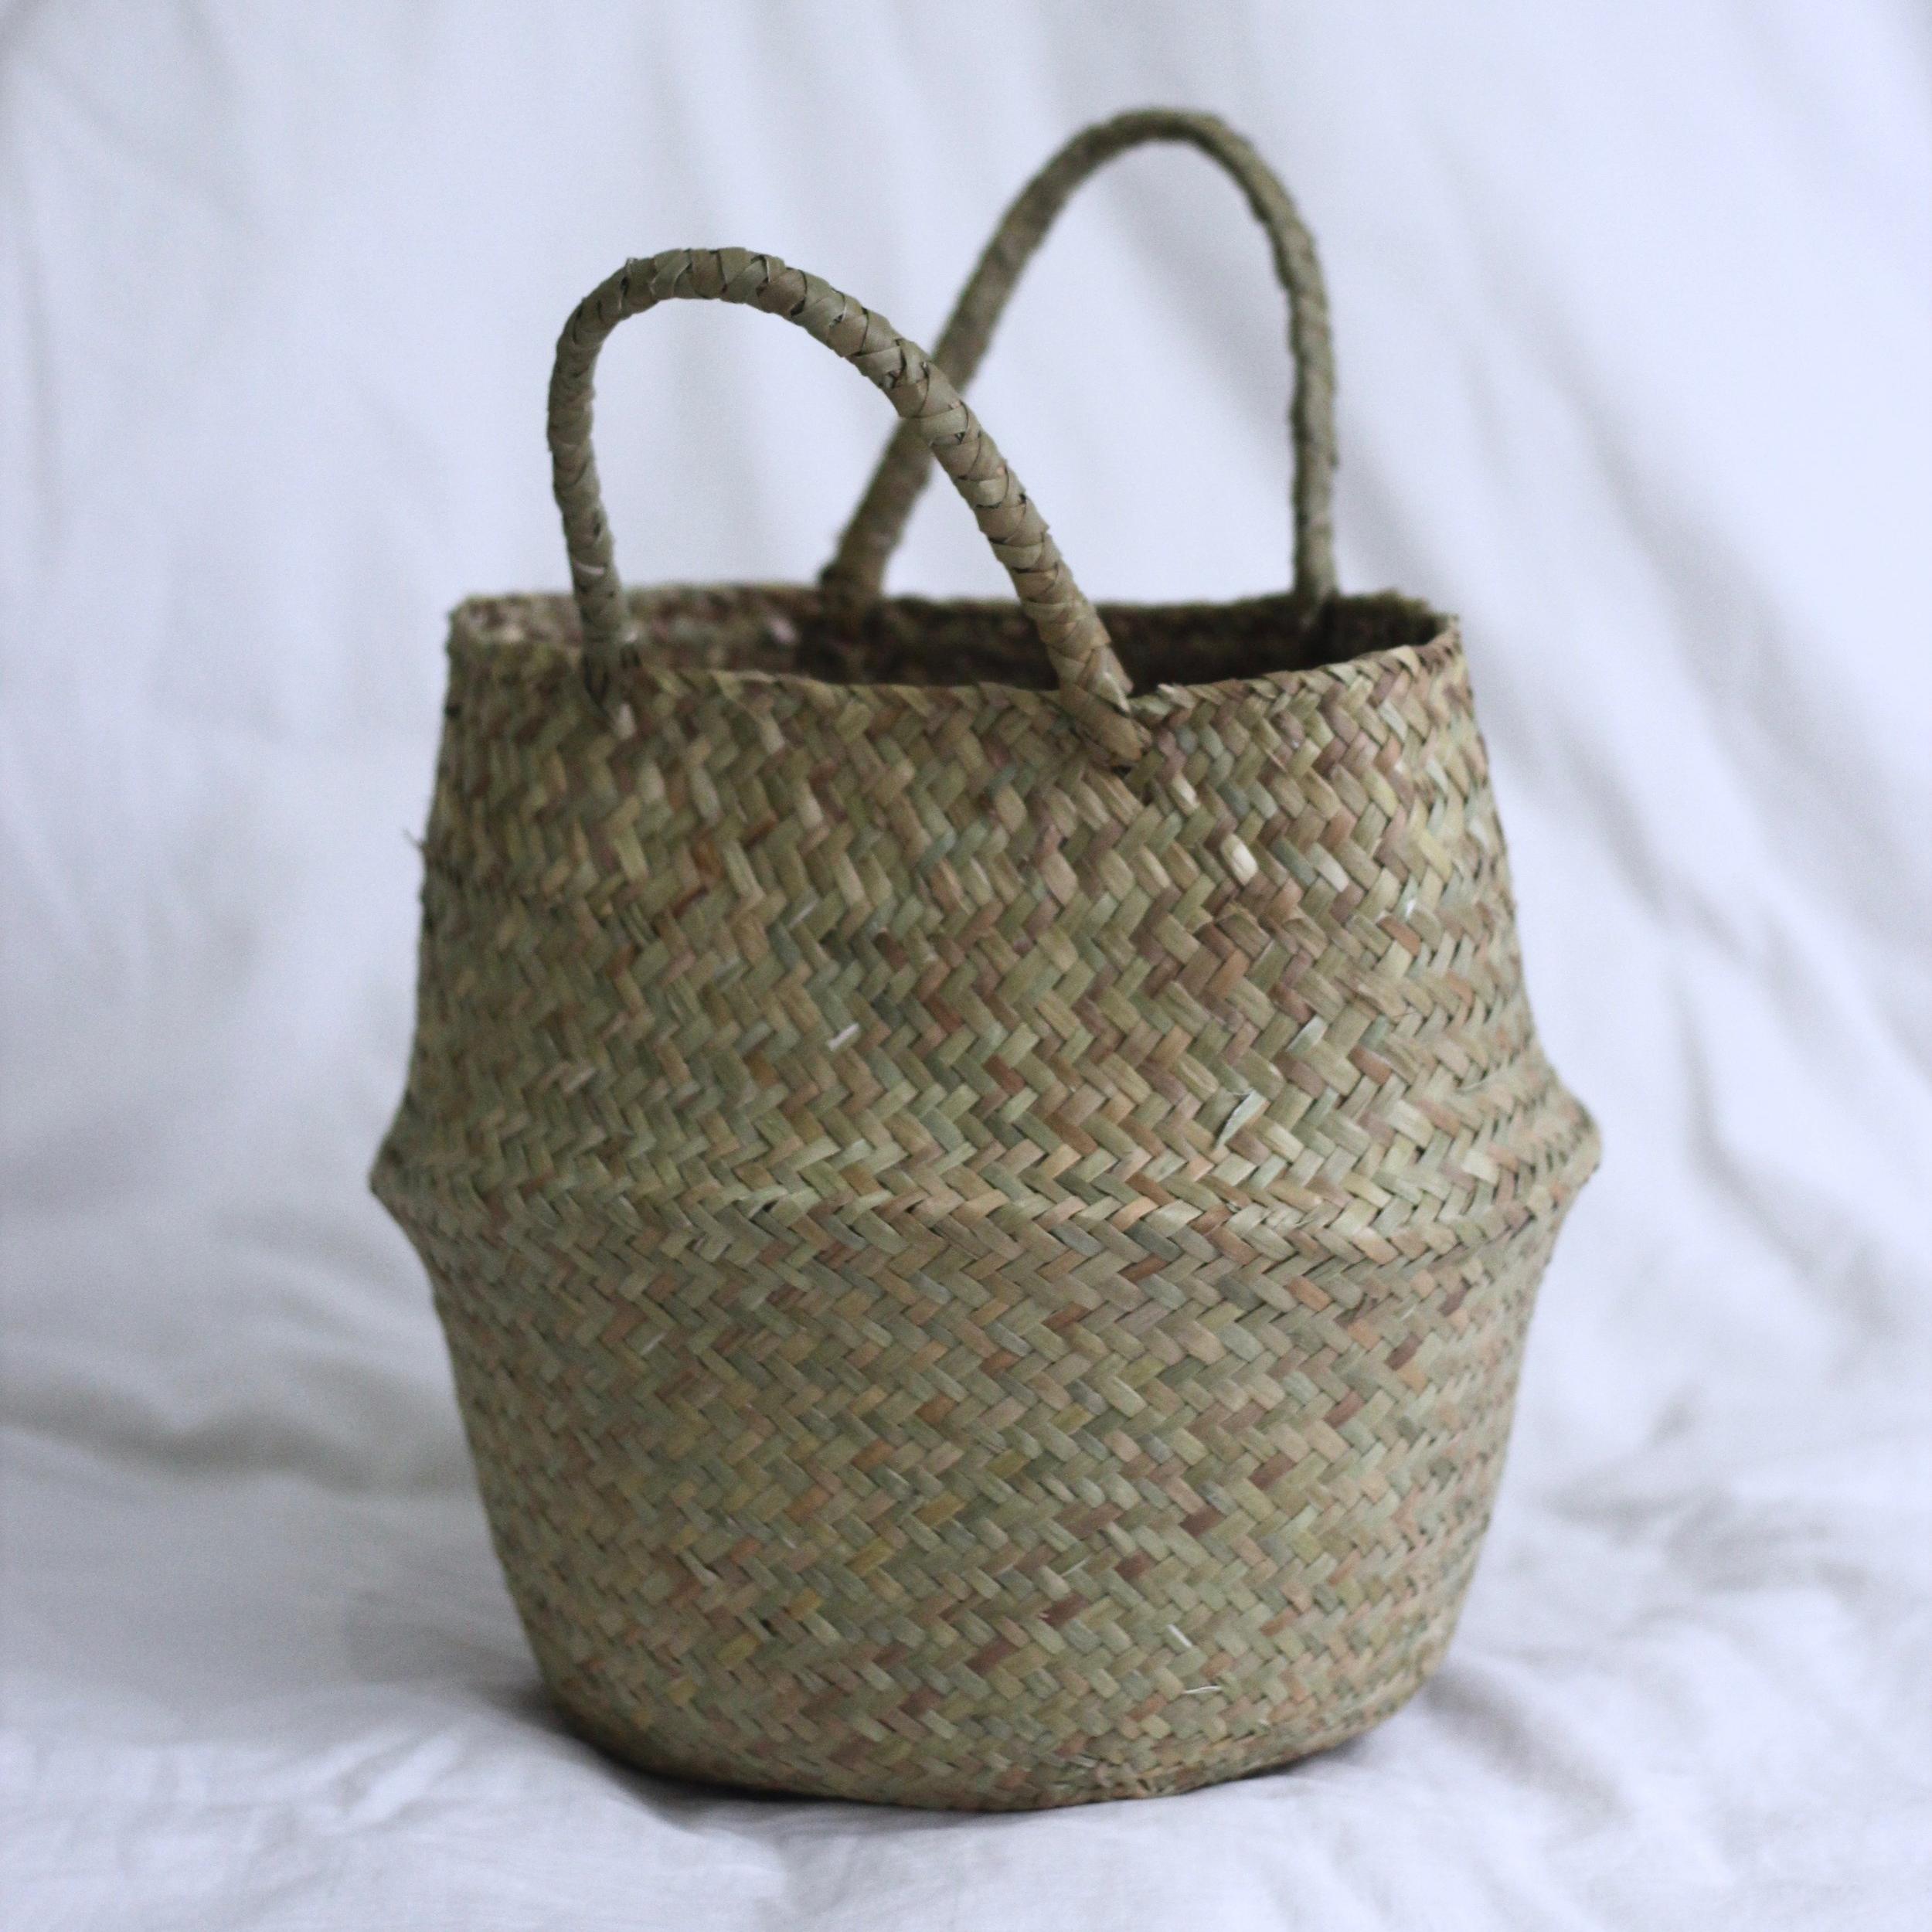 Straw Weaved Basket - Small 1.jpg